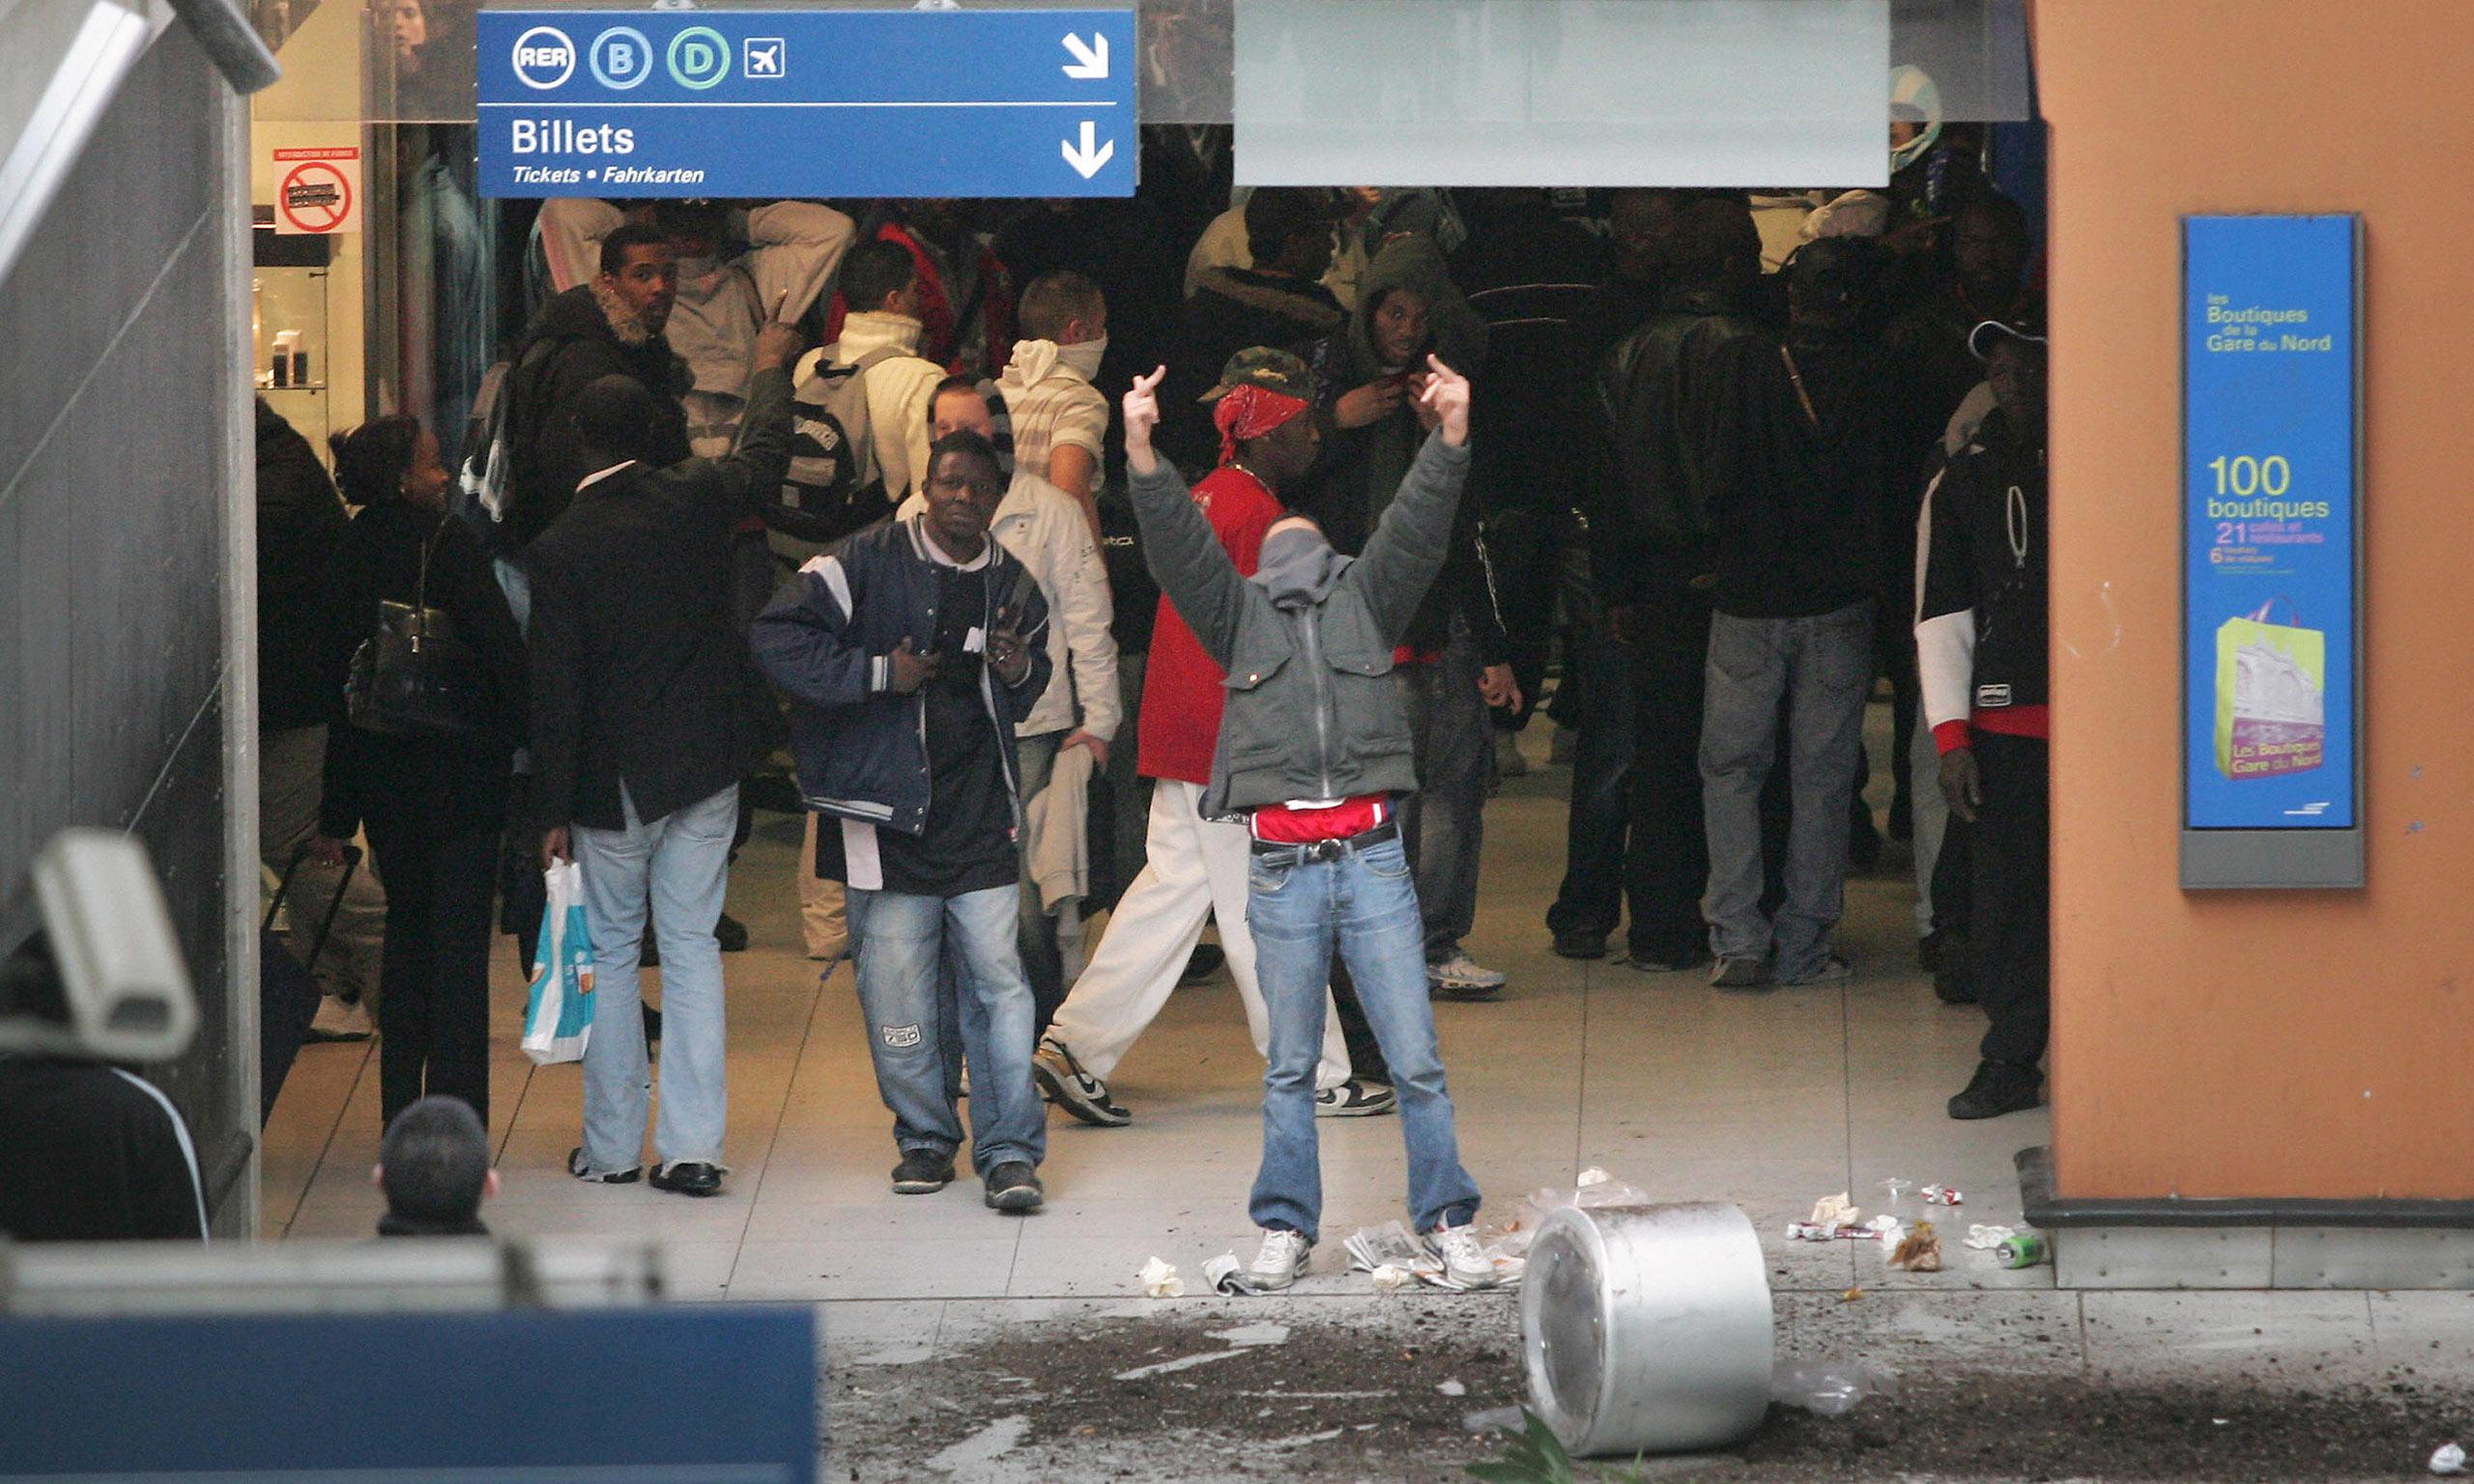 Riots Paris 2007 Riots at The Paris Gare du